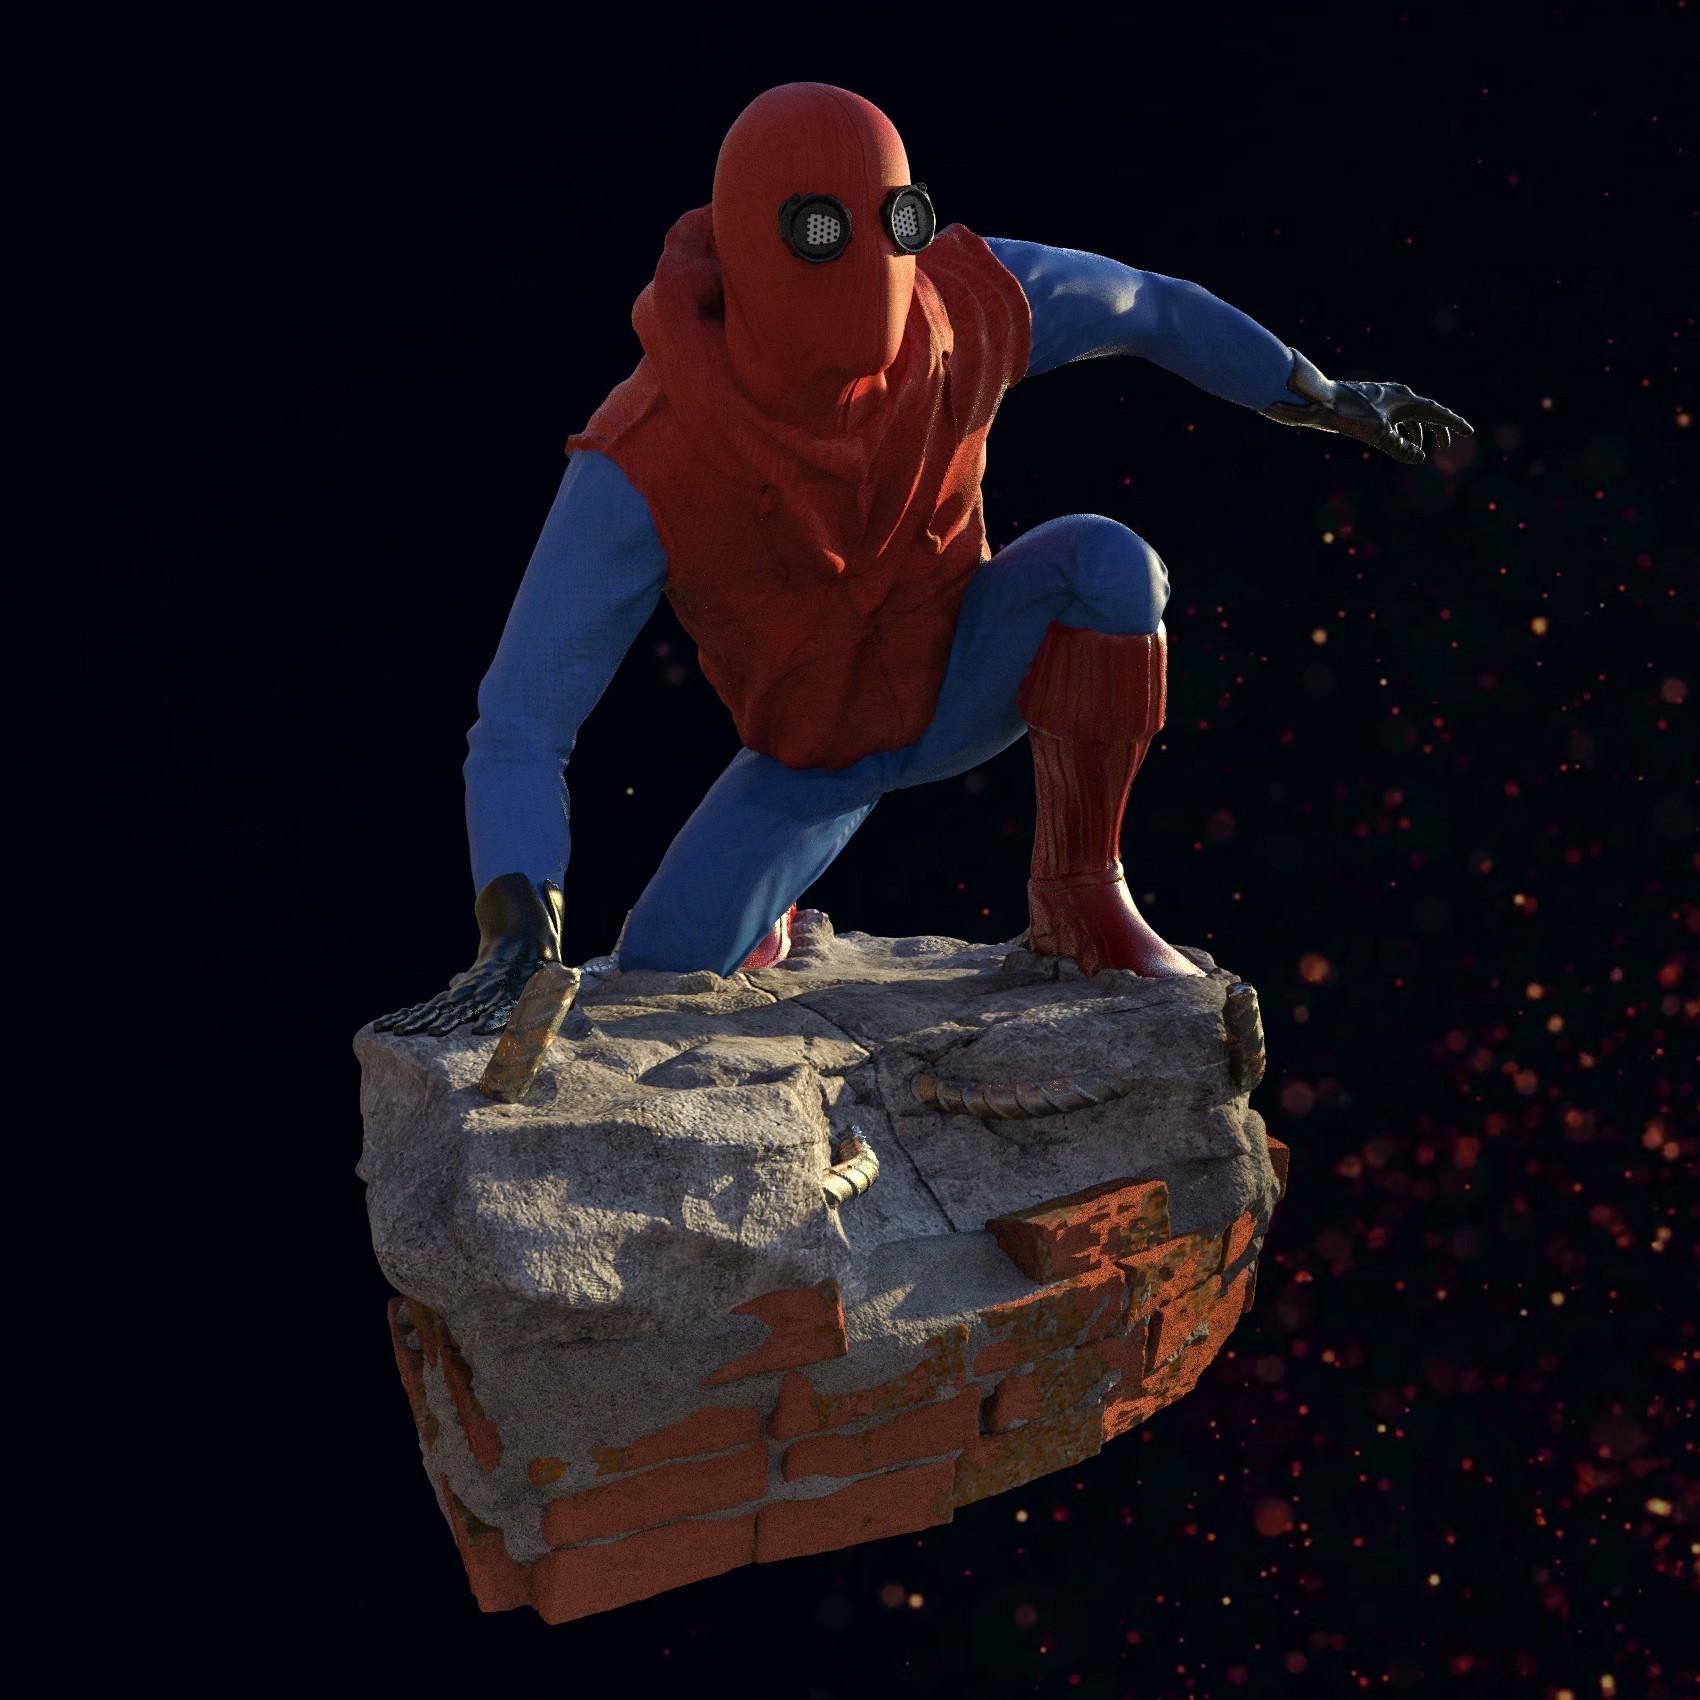 3.jpg Download STL file Spider-Man Homemade Suit • Design to 3D print, tolgaaxu